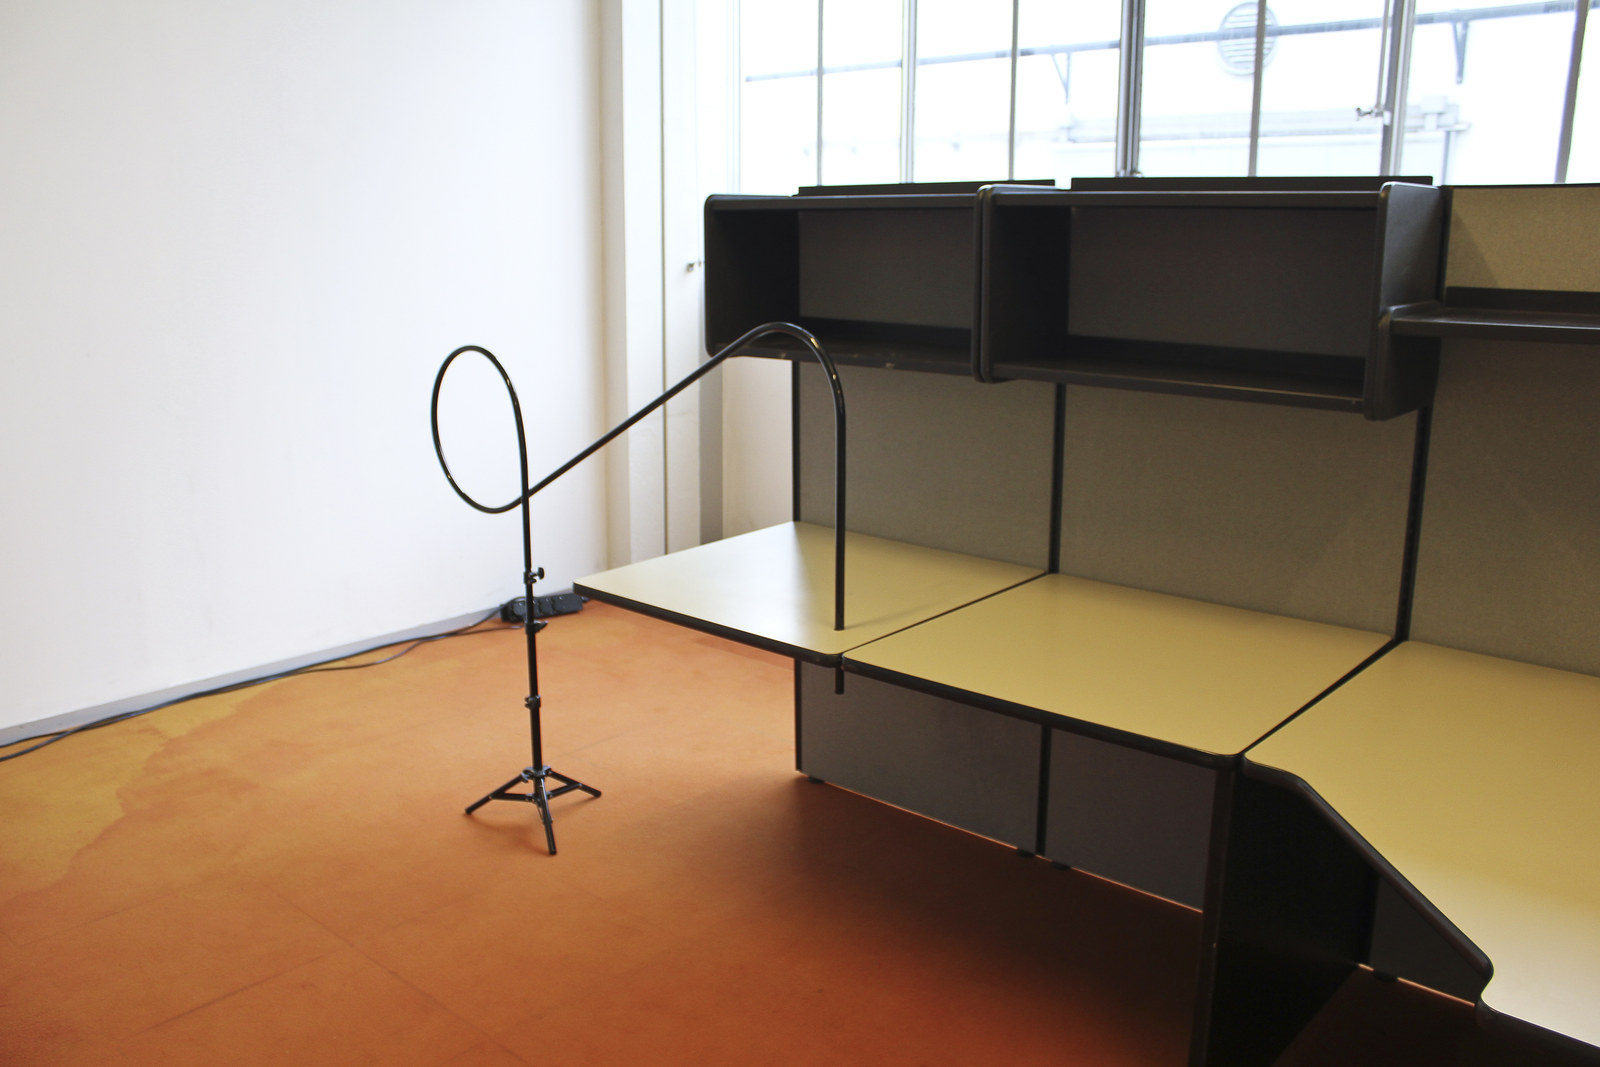 Johann Arens at PAKT, Amsterdam 02